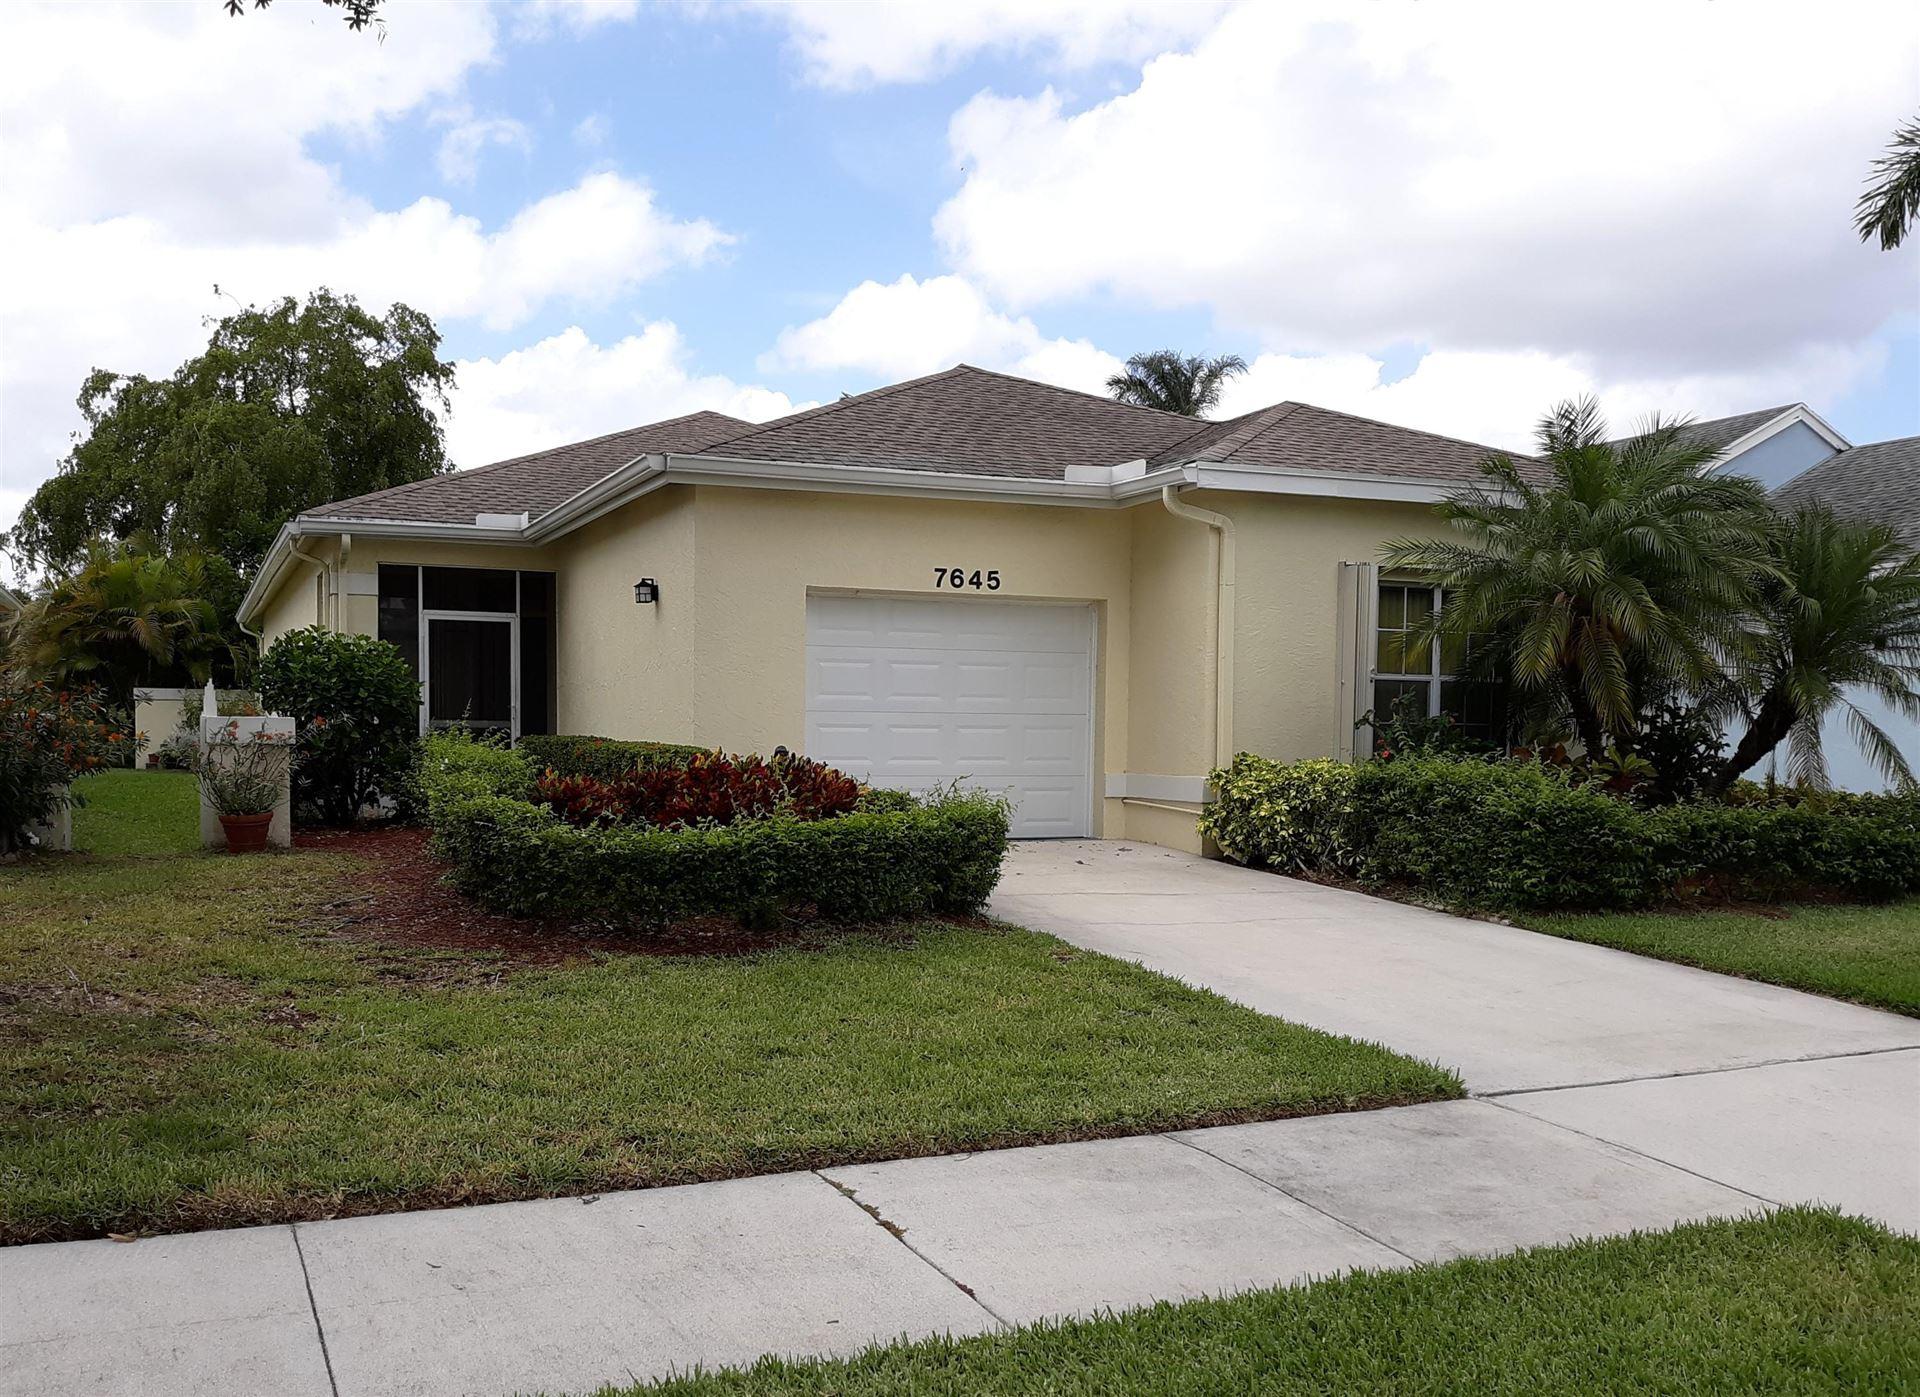 7645 Mansfield Hollow Road, Delray Beach, FL 33446 - #: RX-10716597